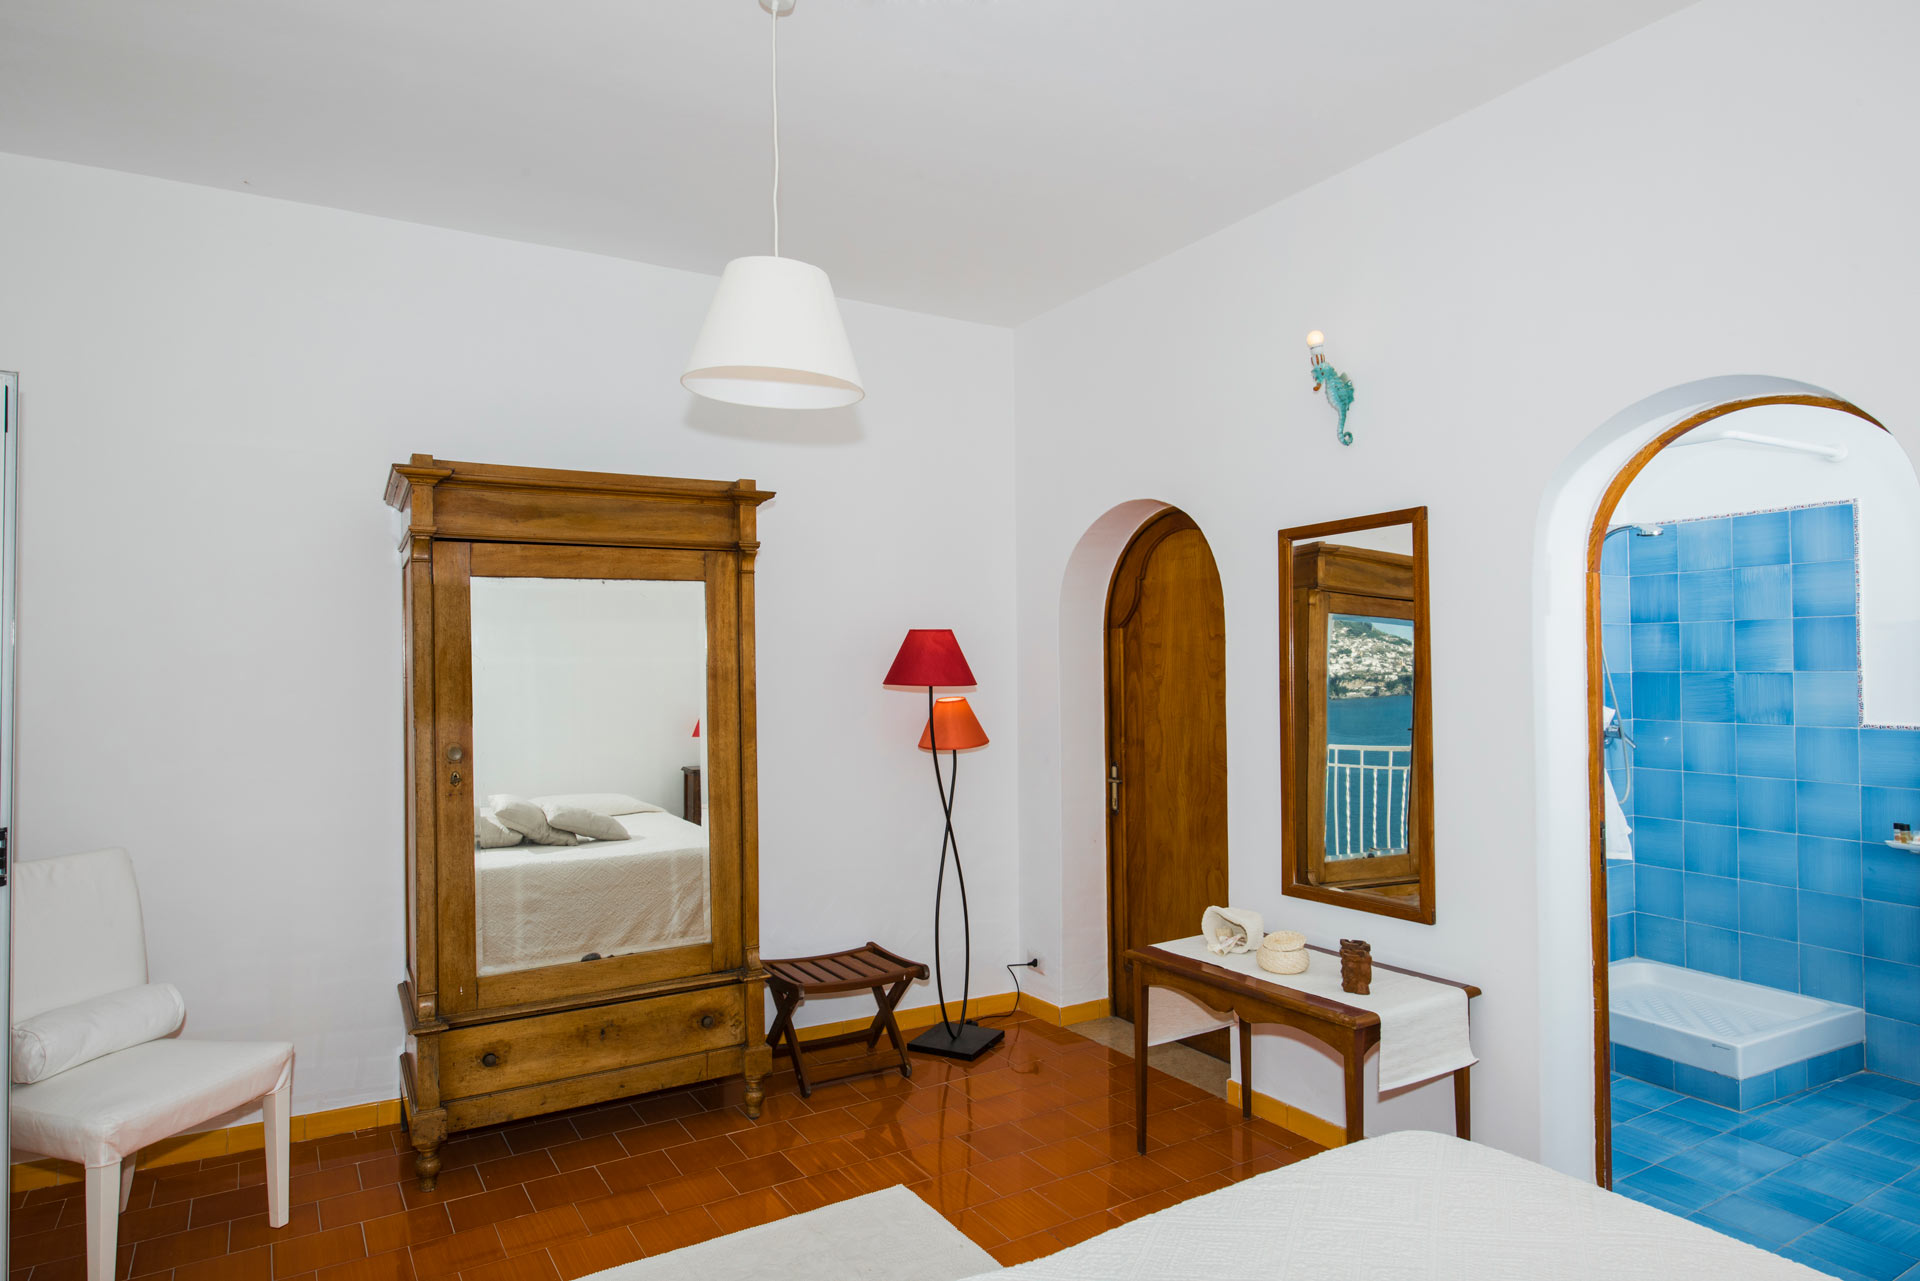 casa_fioravante_villa_positano_15_44